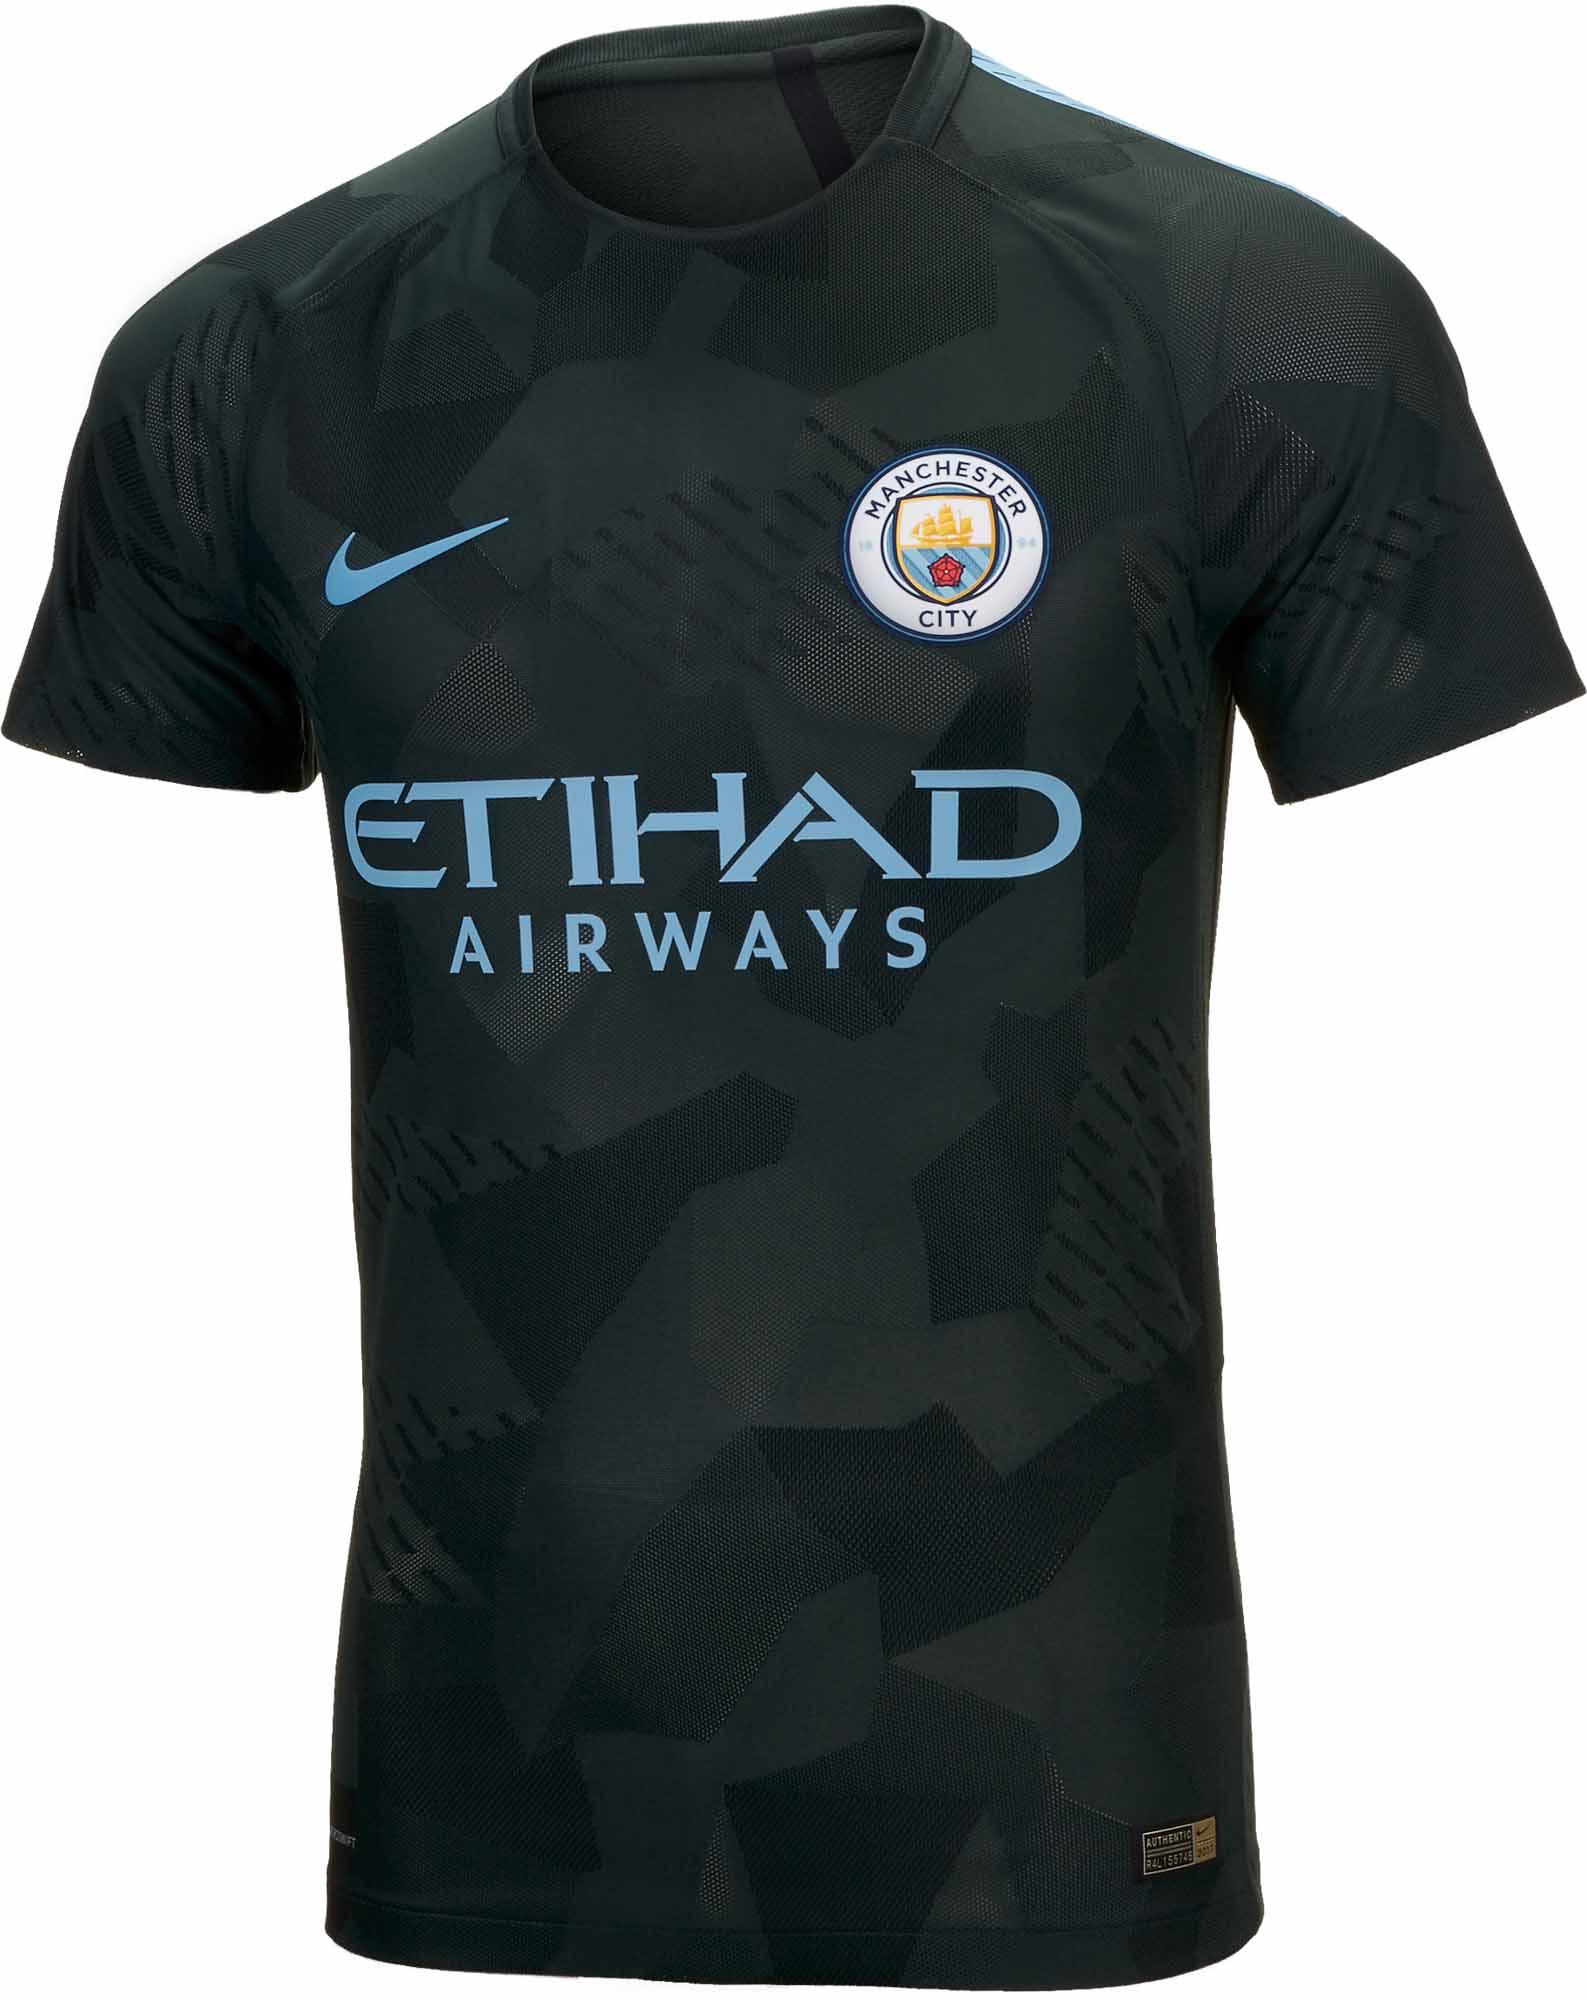 2017/18 Nike Manchester City Match 3rd Jersey